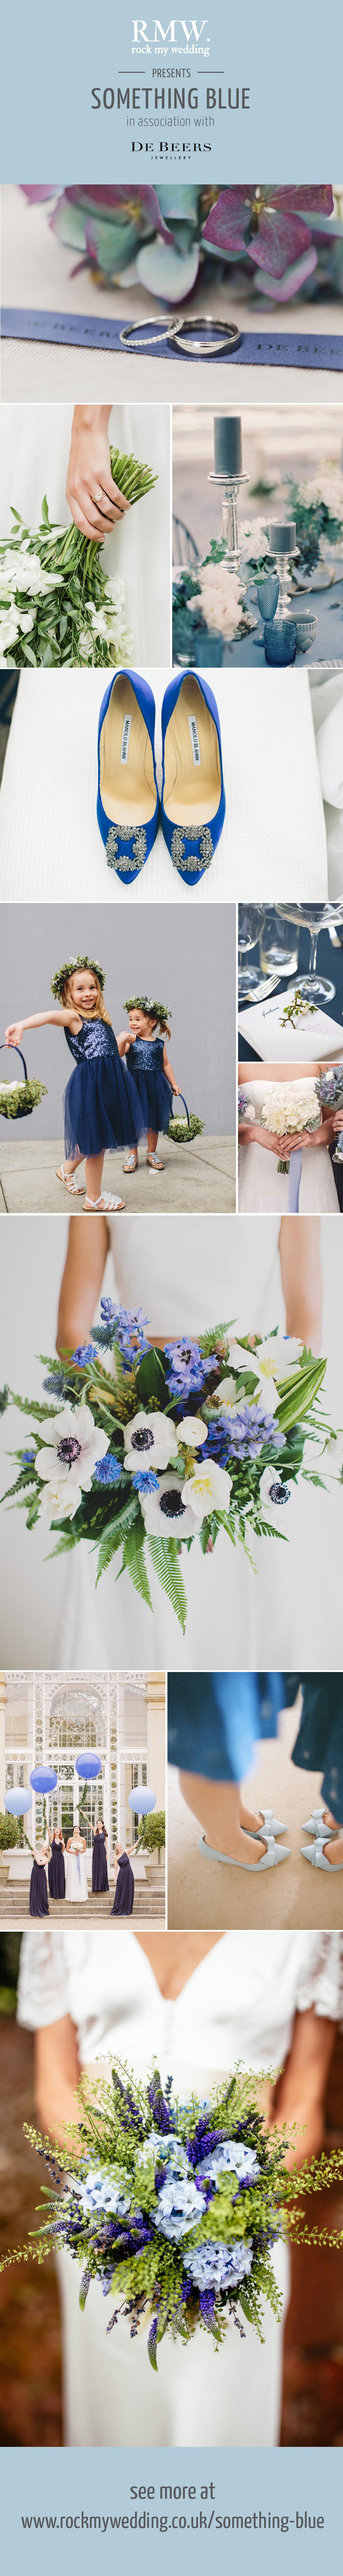 Rock My Wedding Something Blue Wedding Inspiration & Ideas in Association with De Beers Fine Jewellery